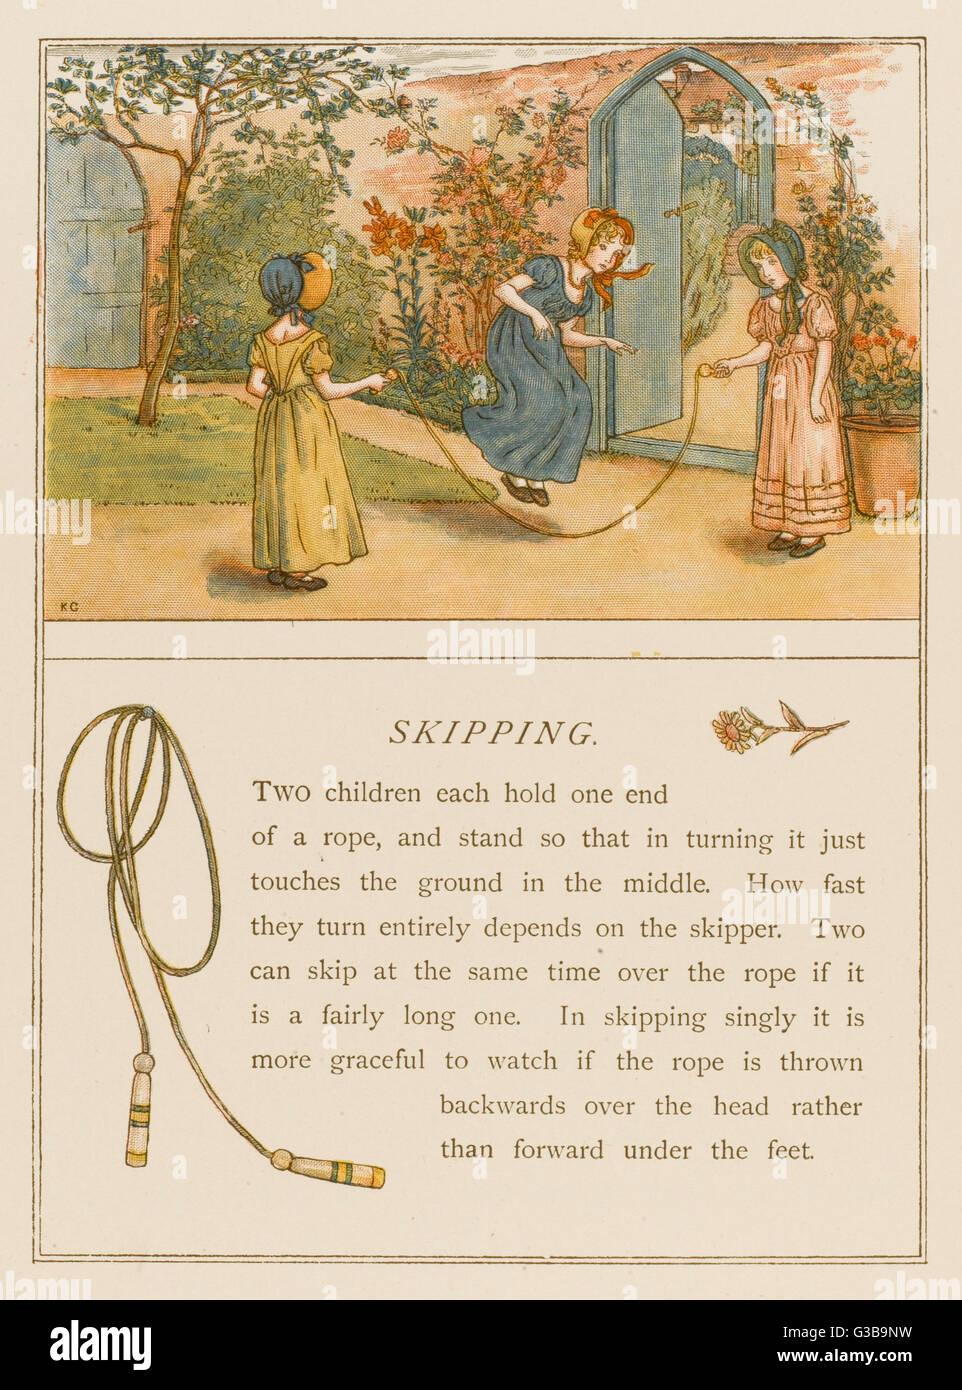 Ragazze vittoriane nei cofani saltando data: 1889 Immagini Stock